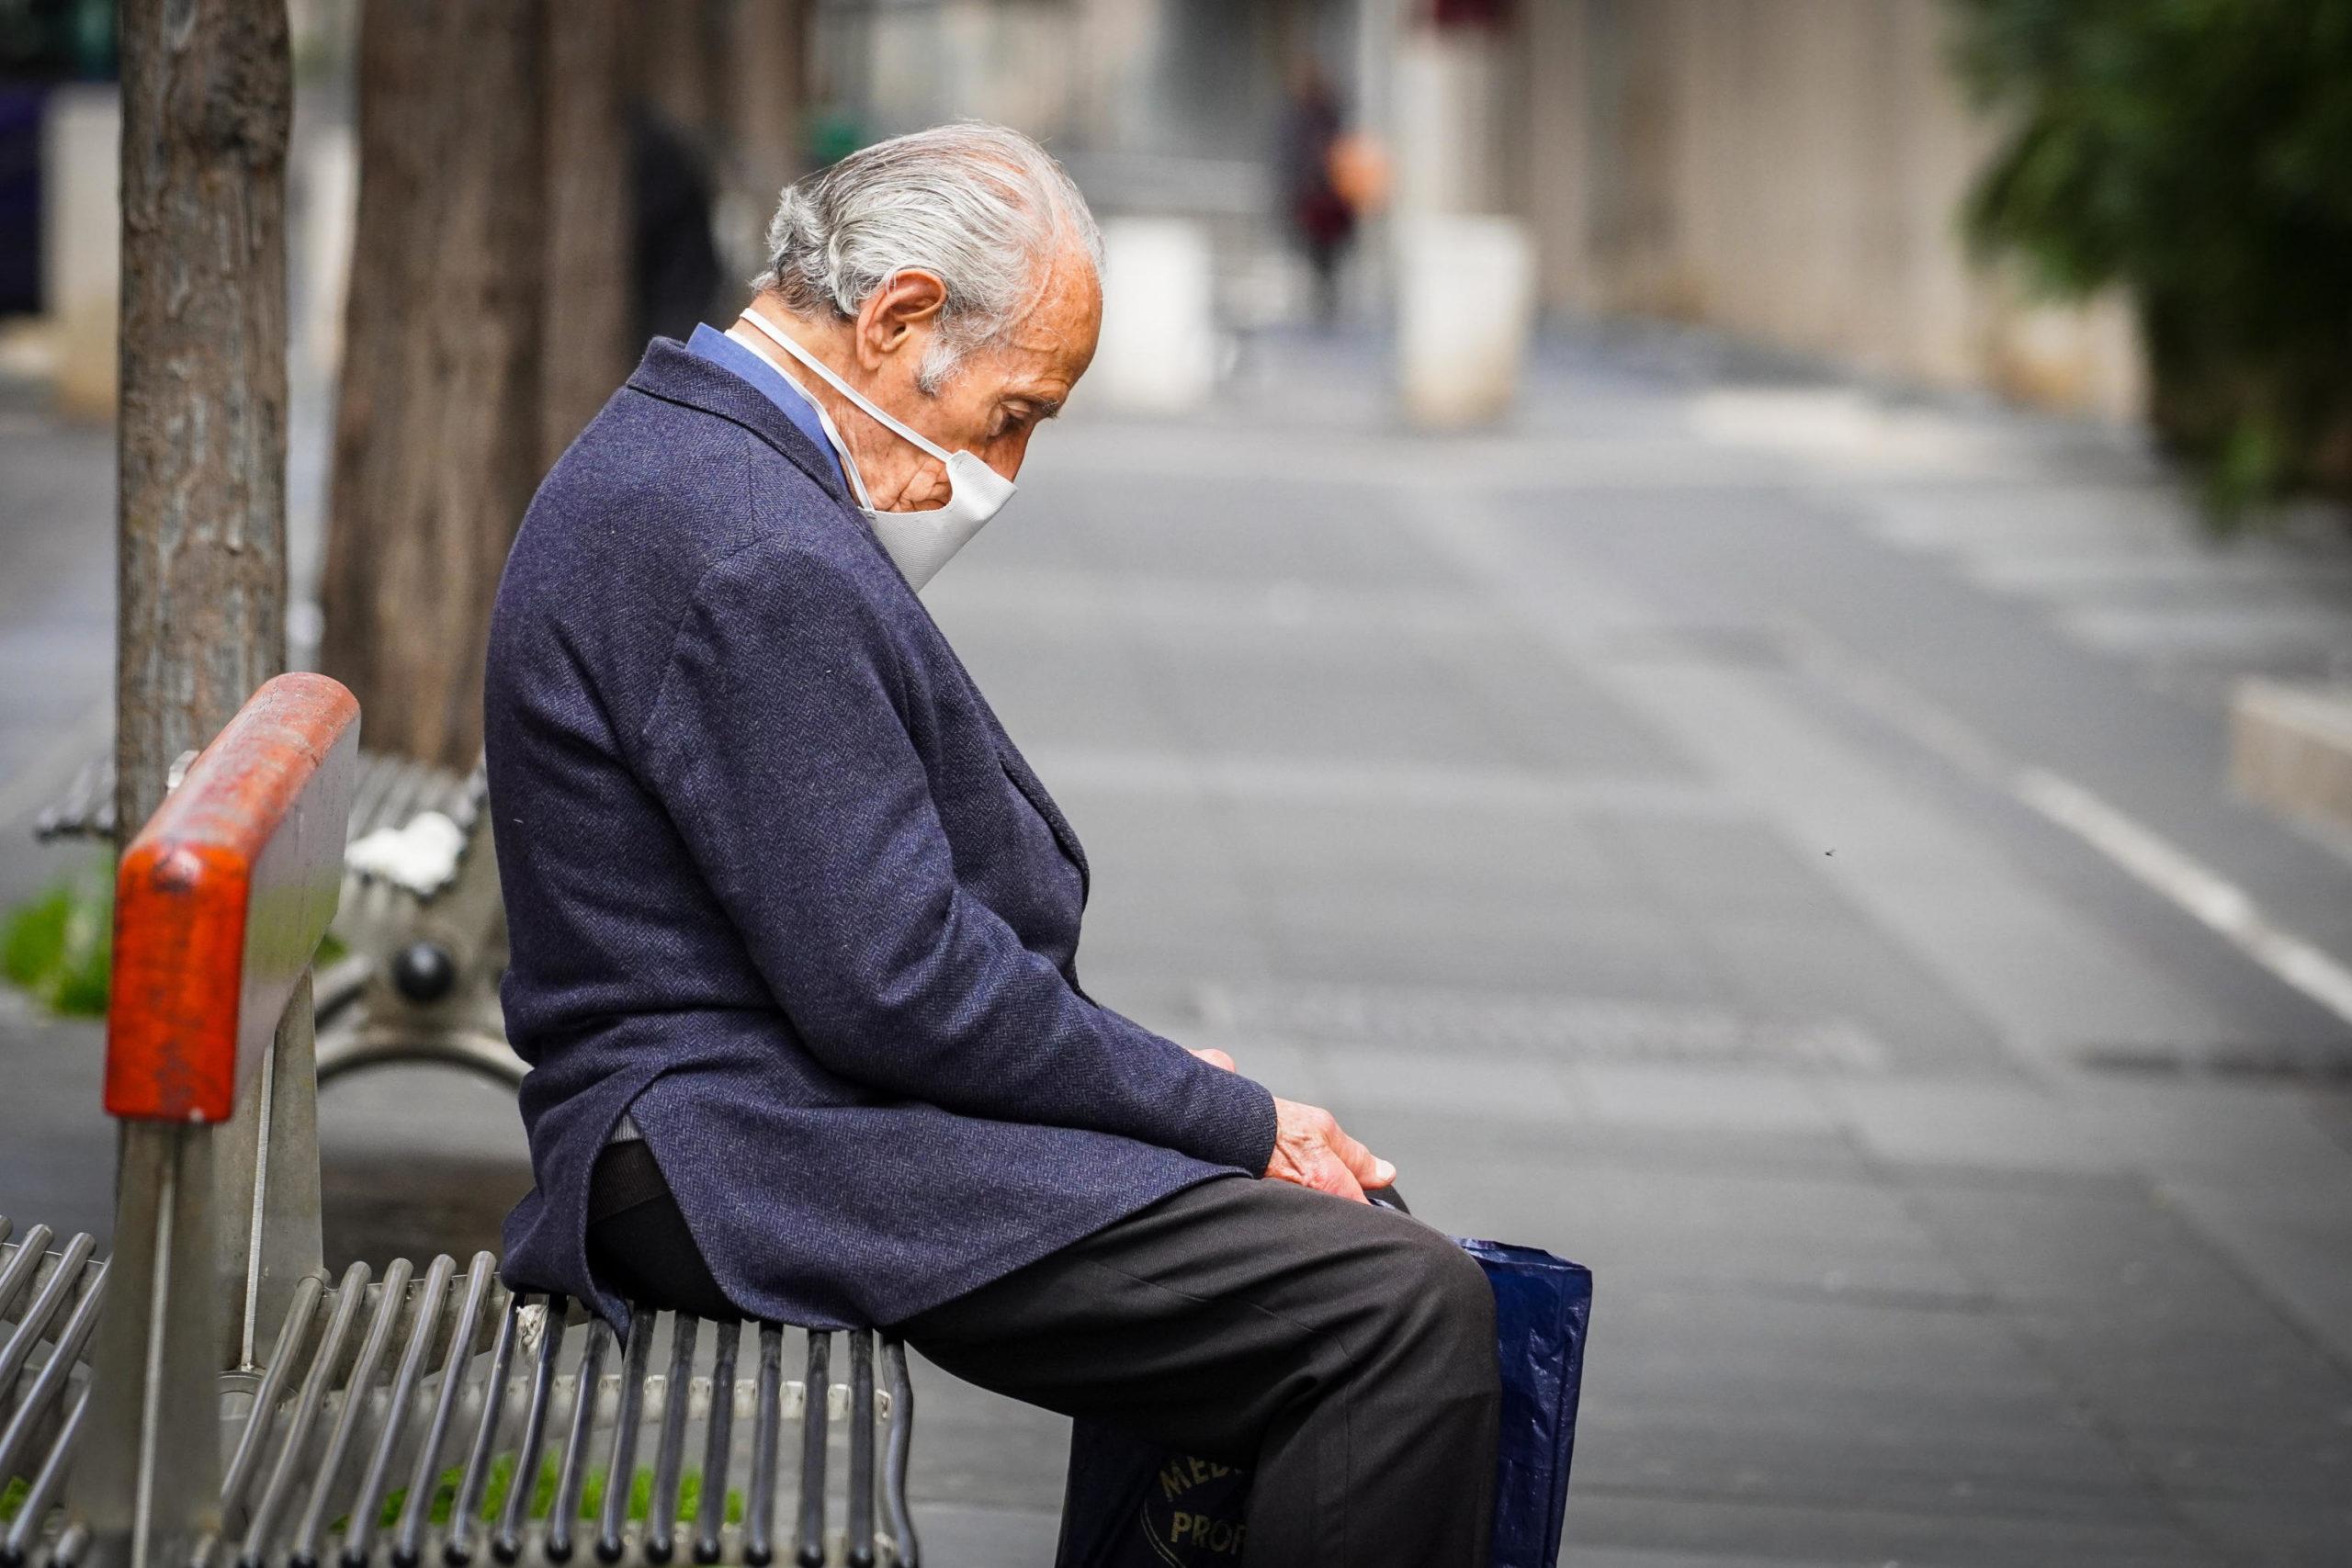 Un uomo con la mascherina seduto su una panchina a Napoli